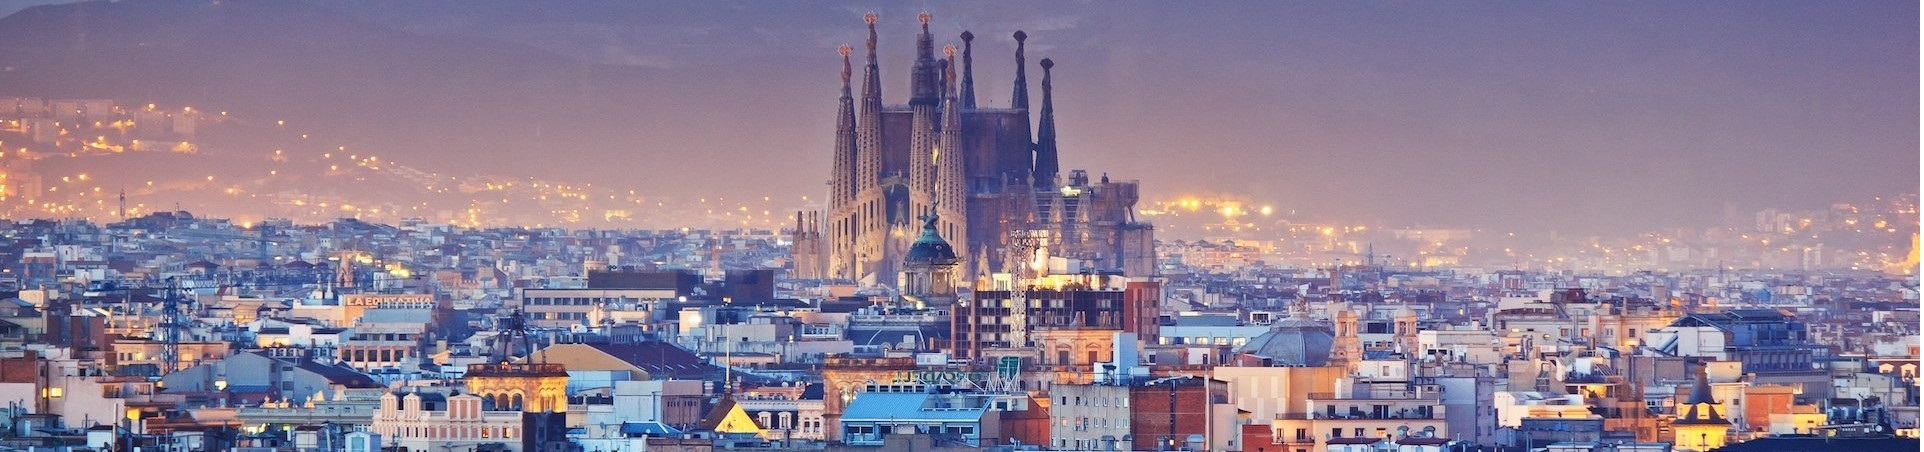 barcelona2-1920x565-1920x565